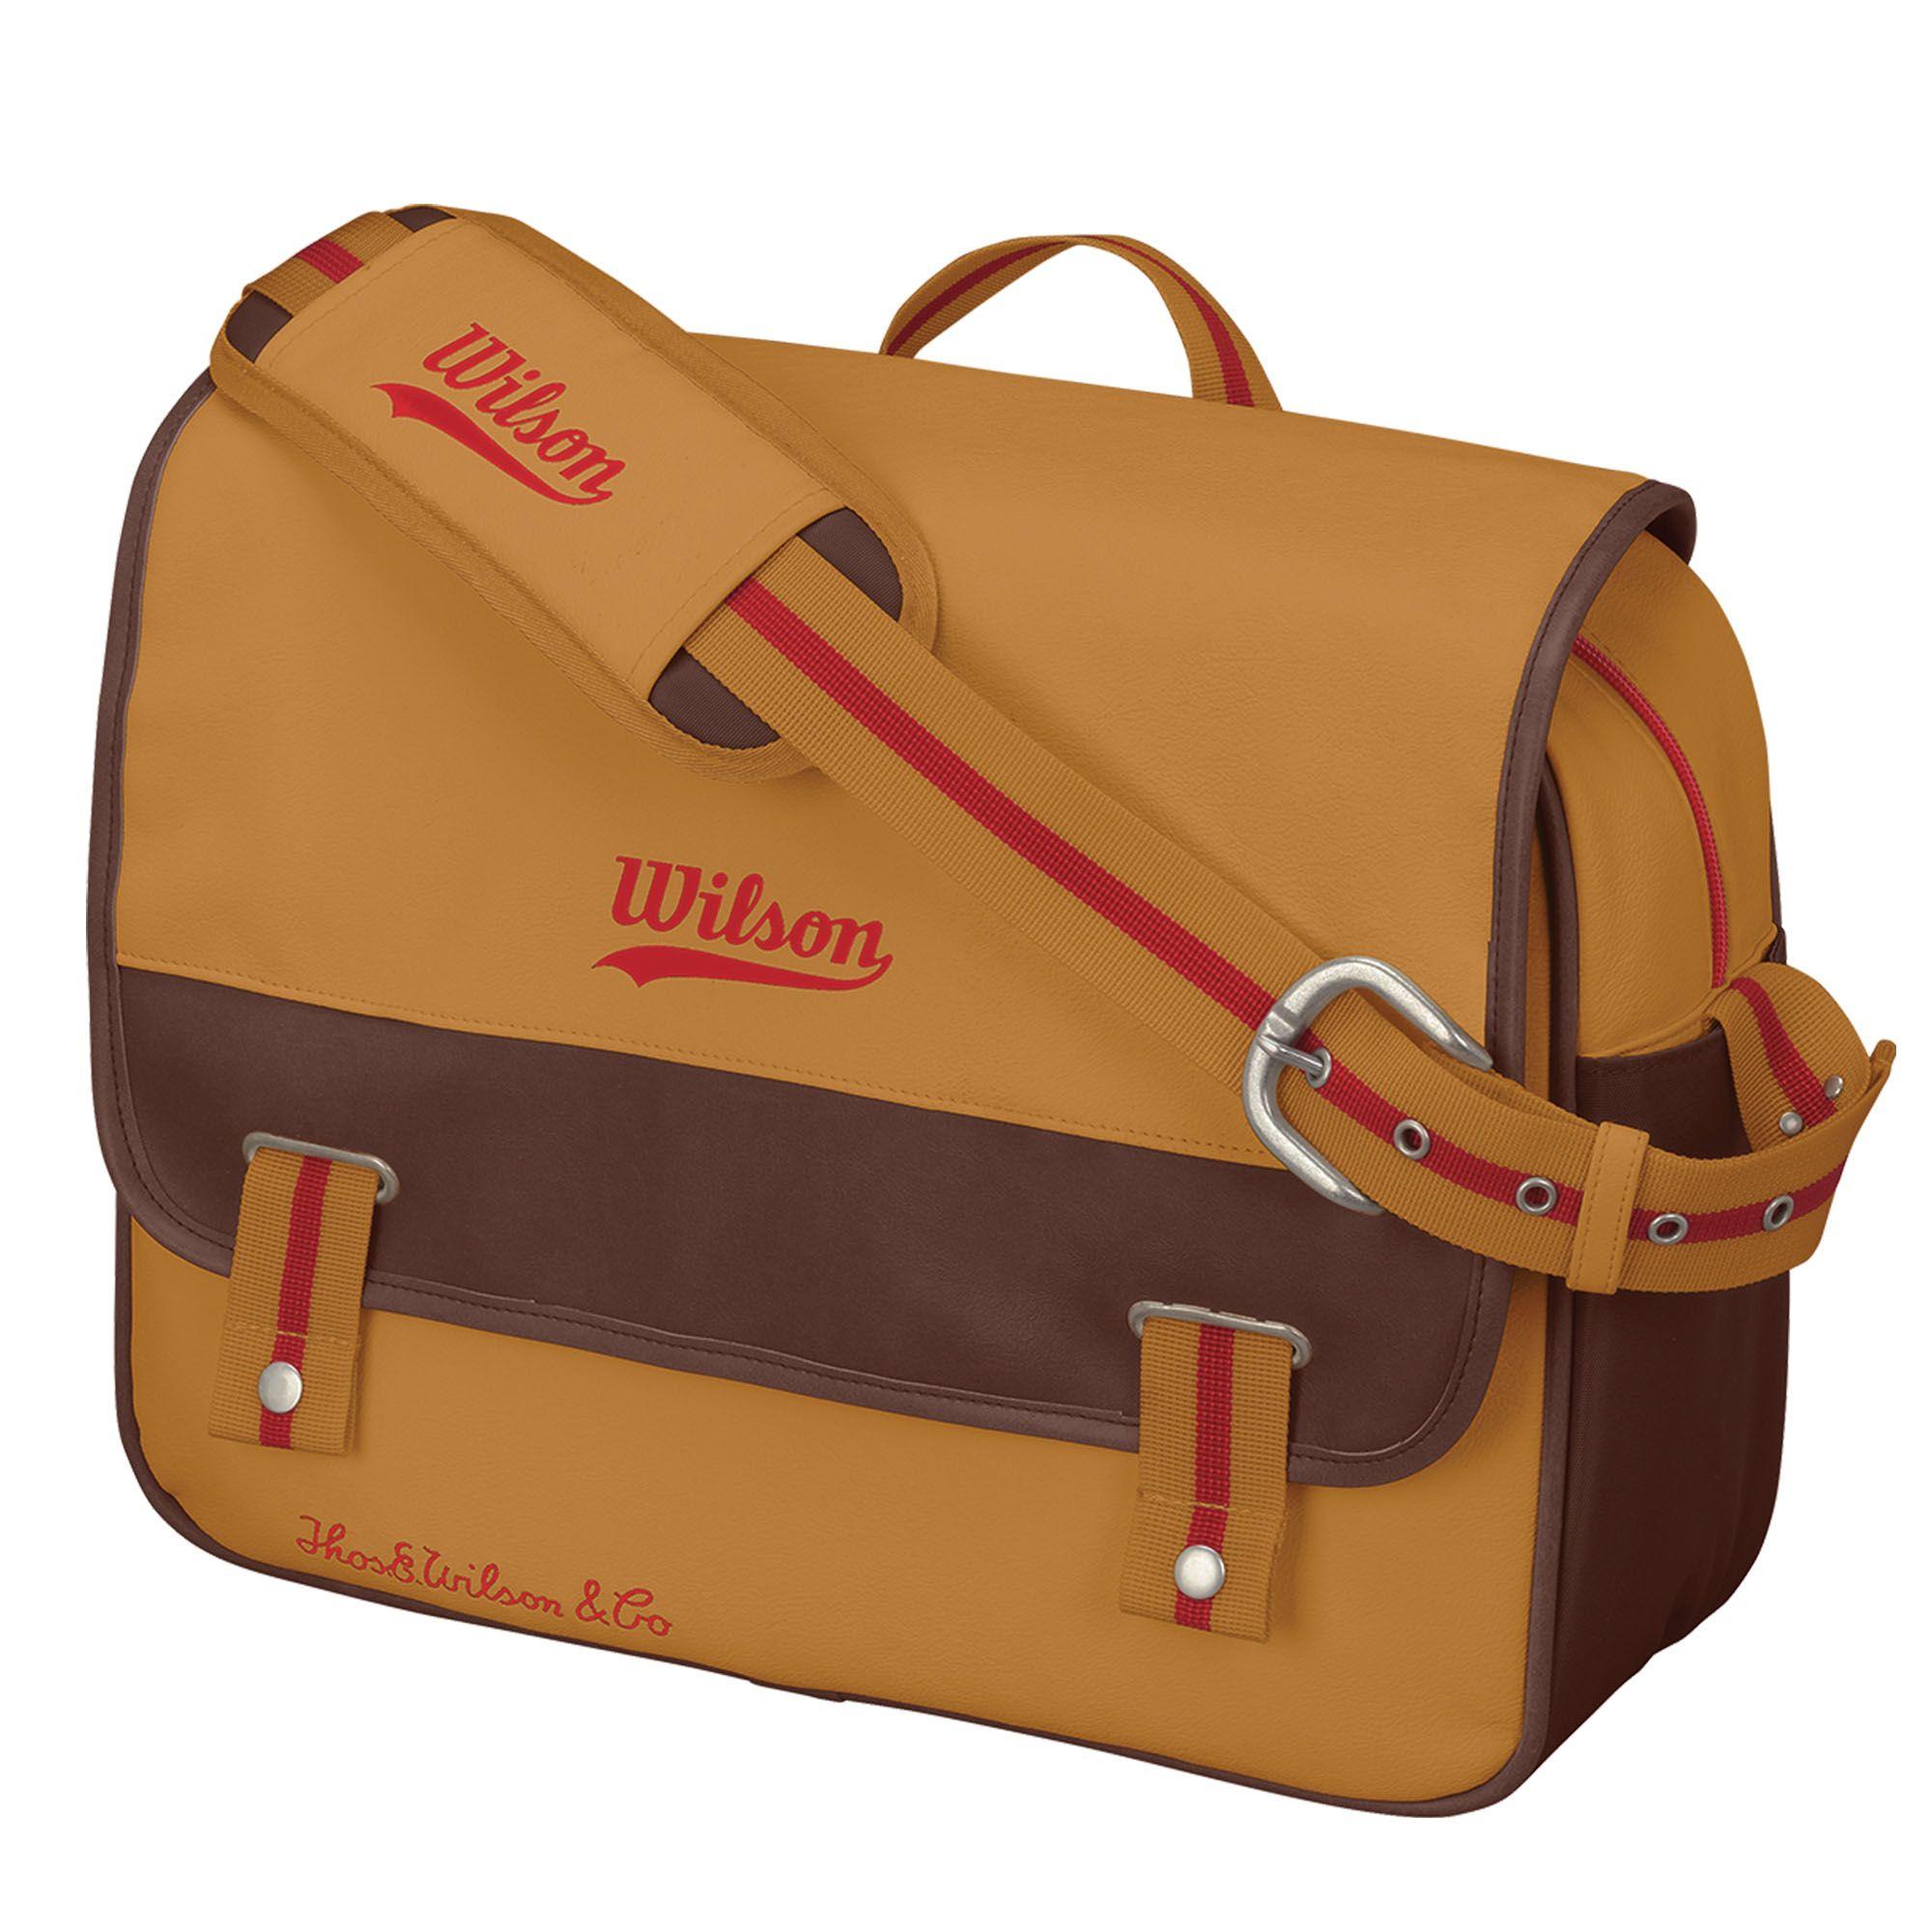 Wilson Heritage Messenger Bag Sweatband Com